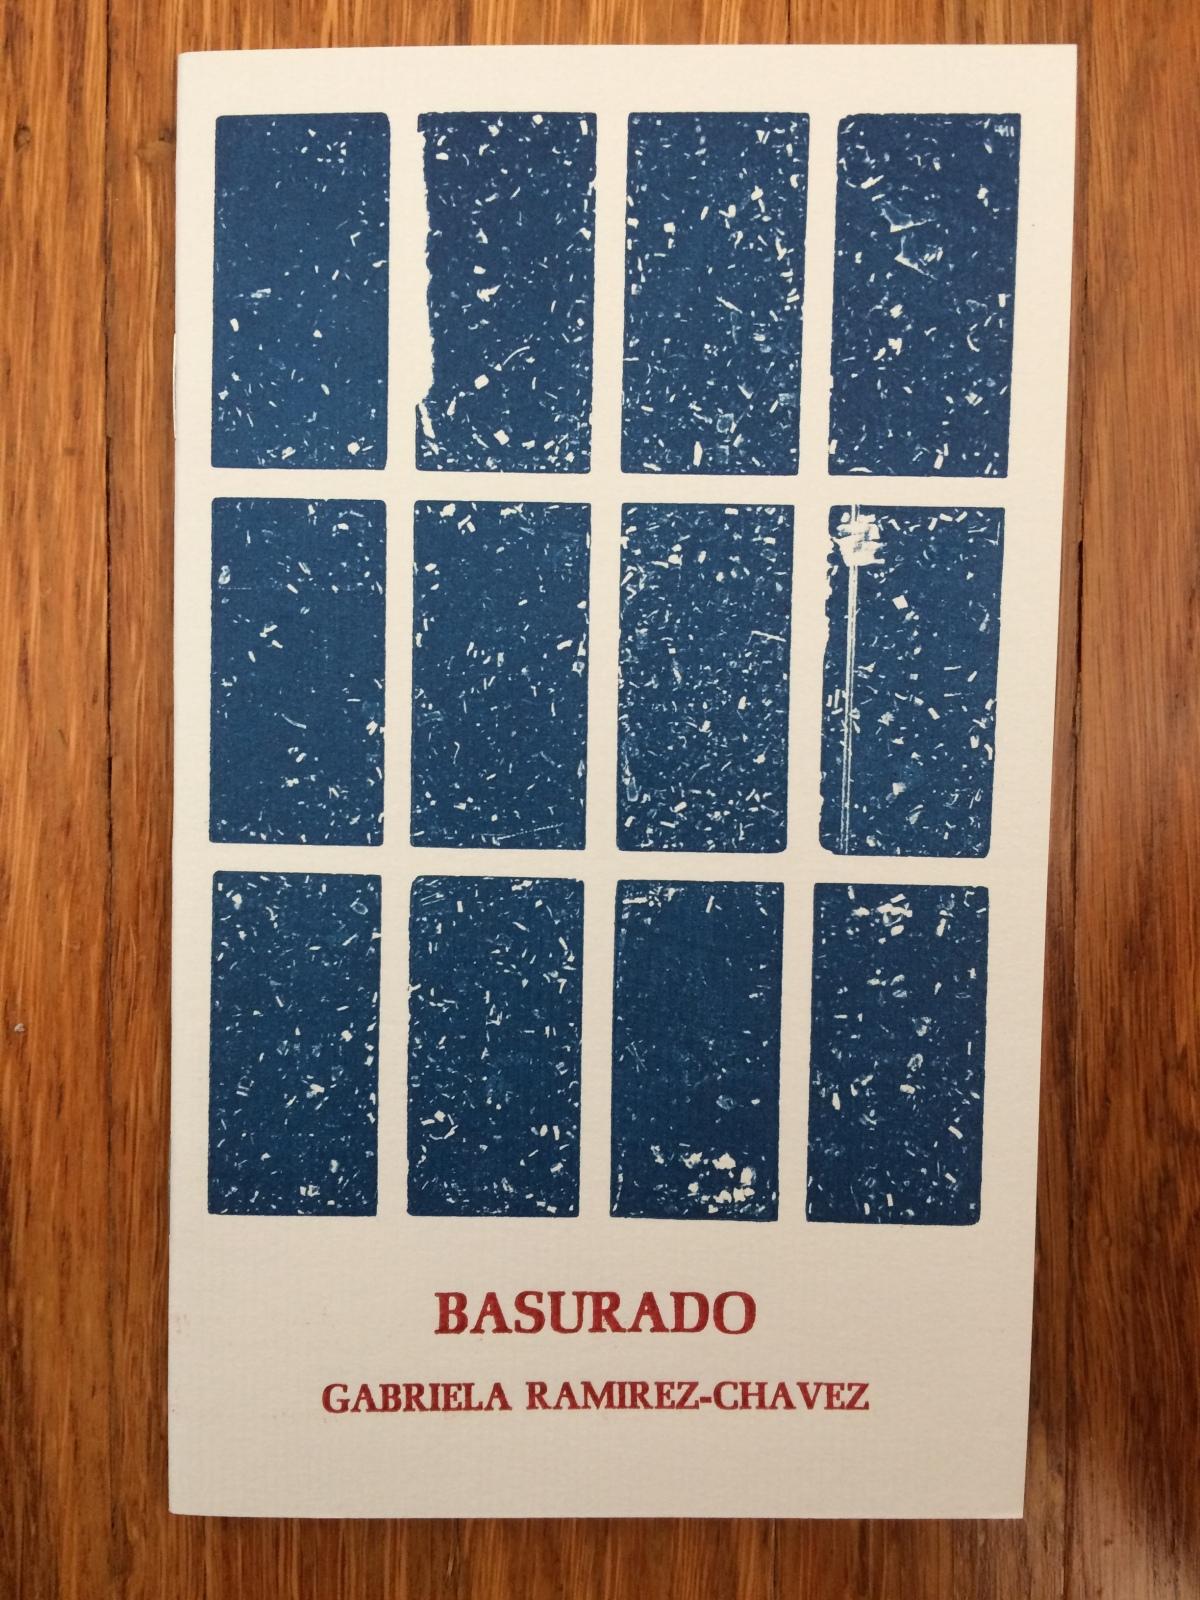 Basurado, by Gabriela Ramirez-Chavez -- designed and printed at Impart Ink